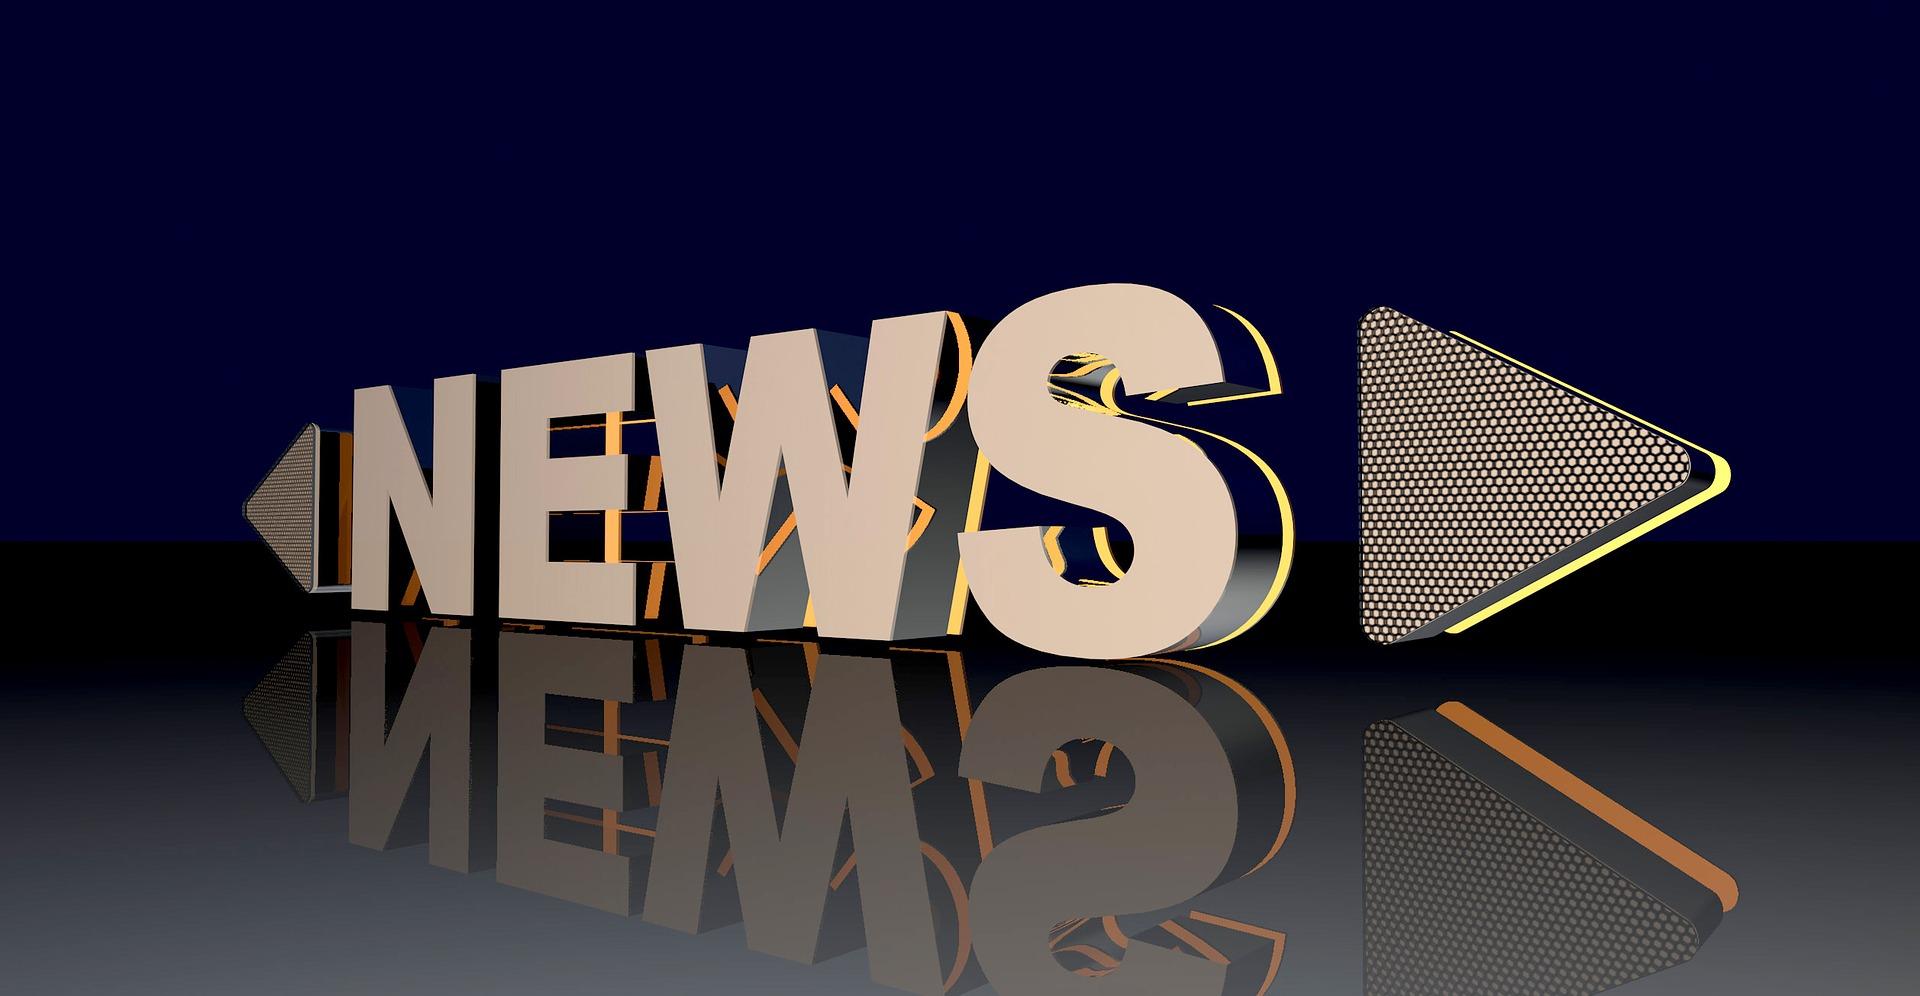 news-1648518_1920